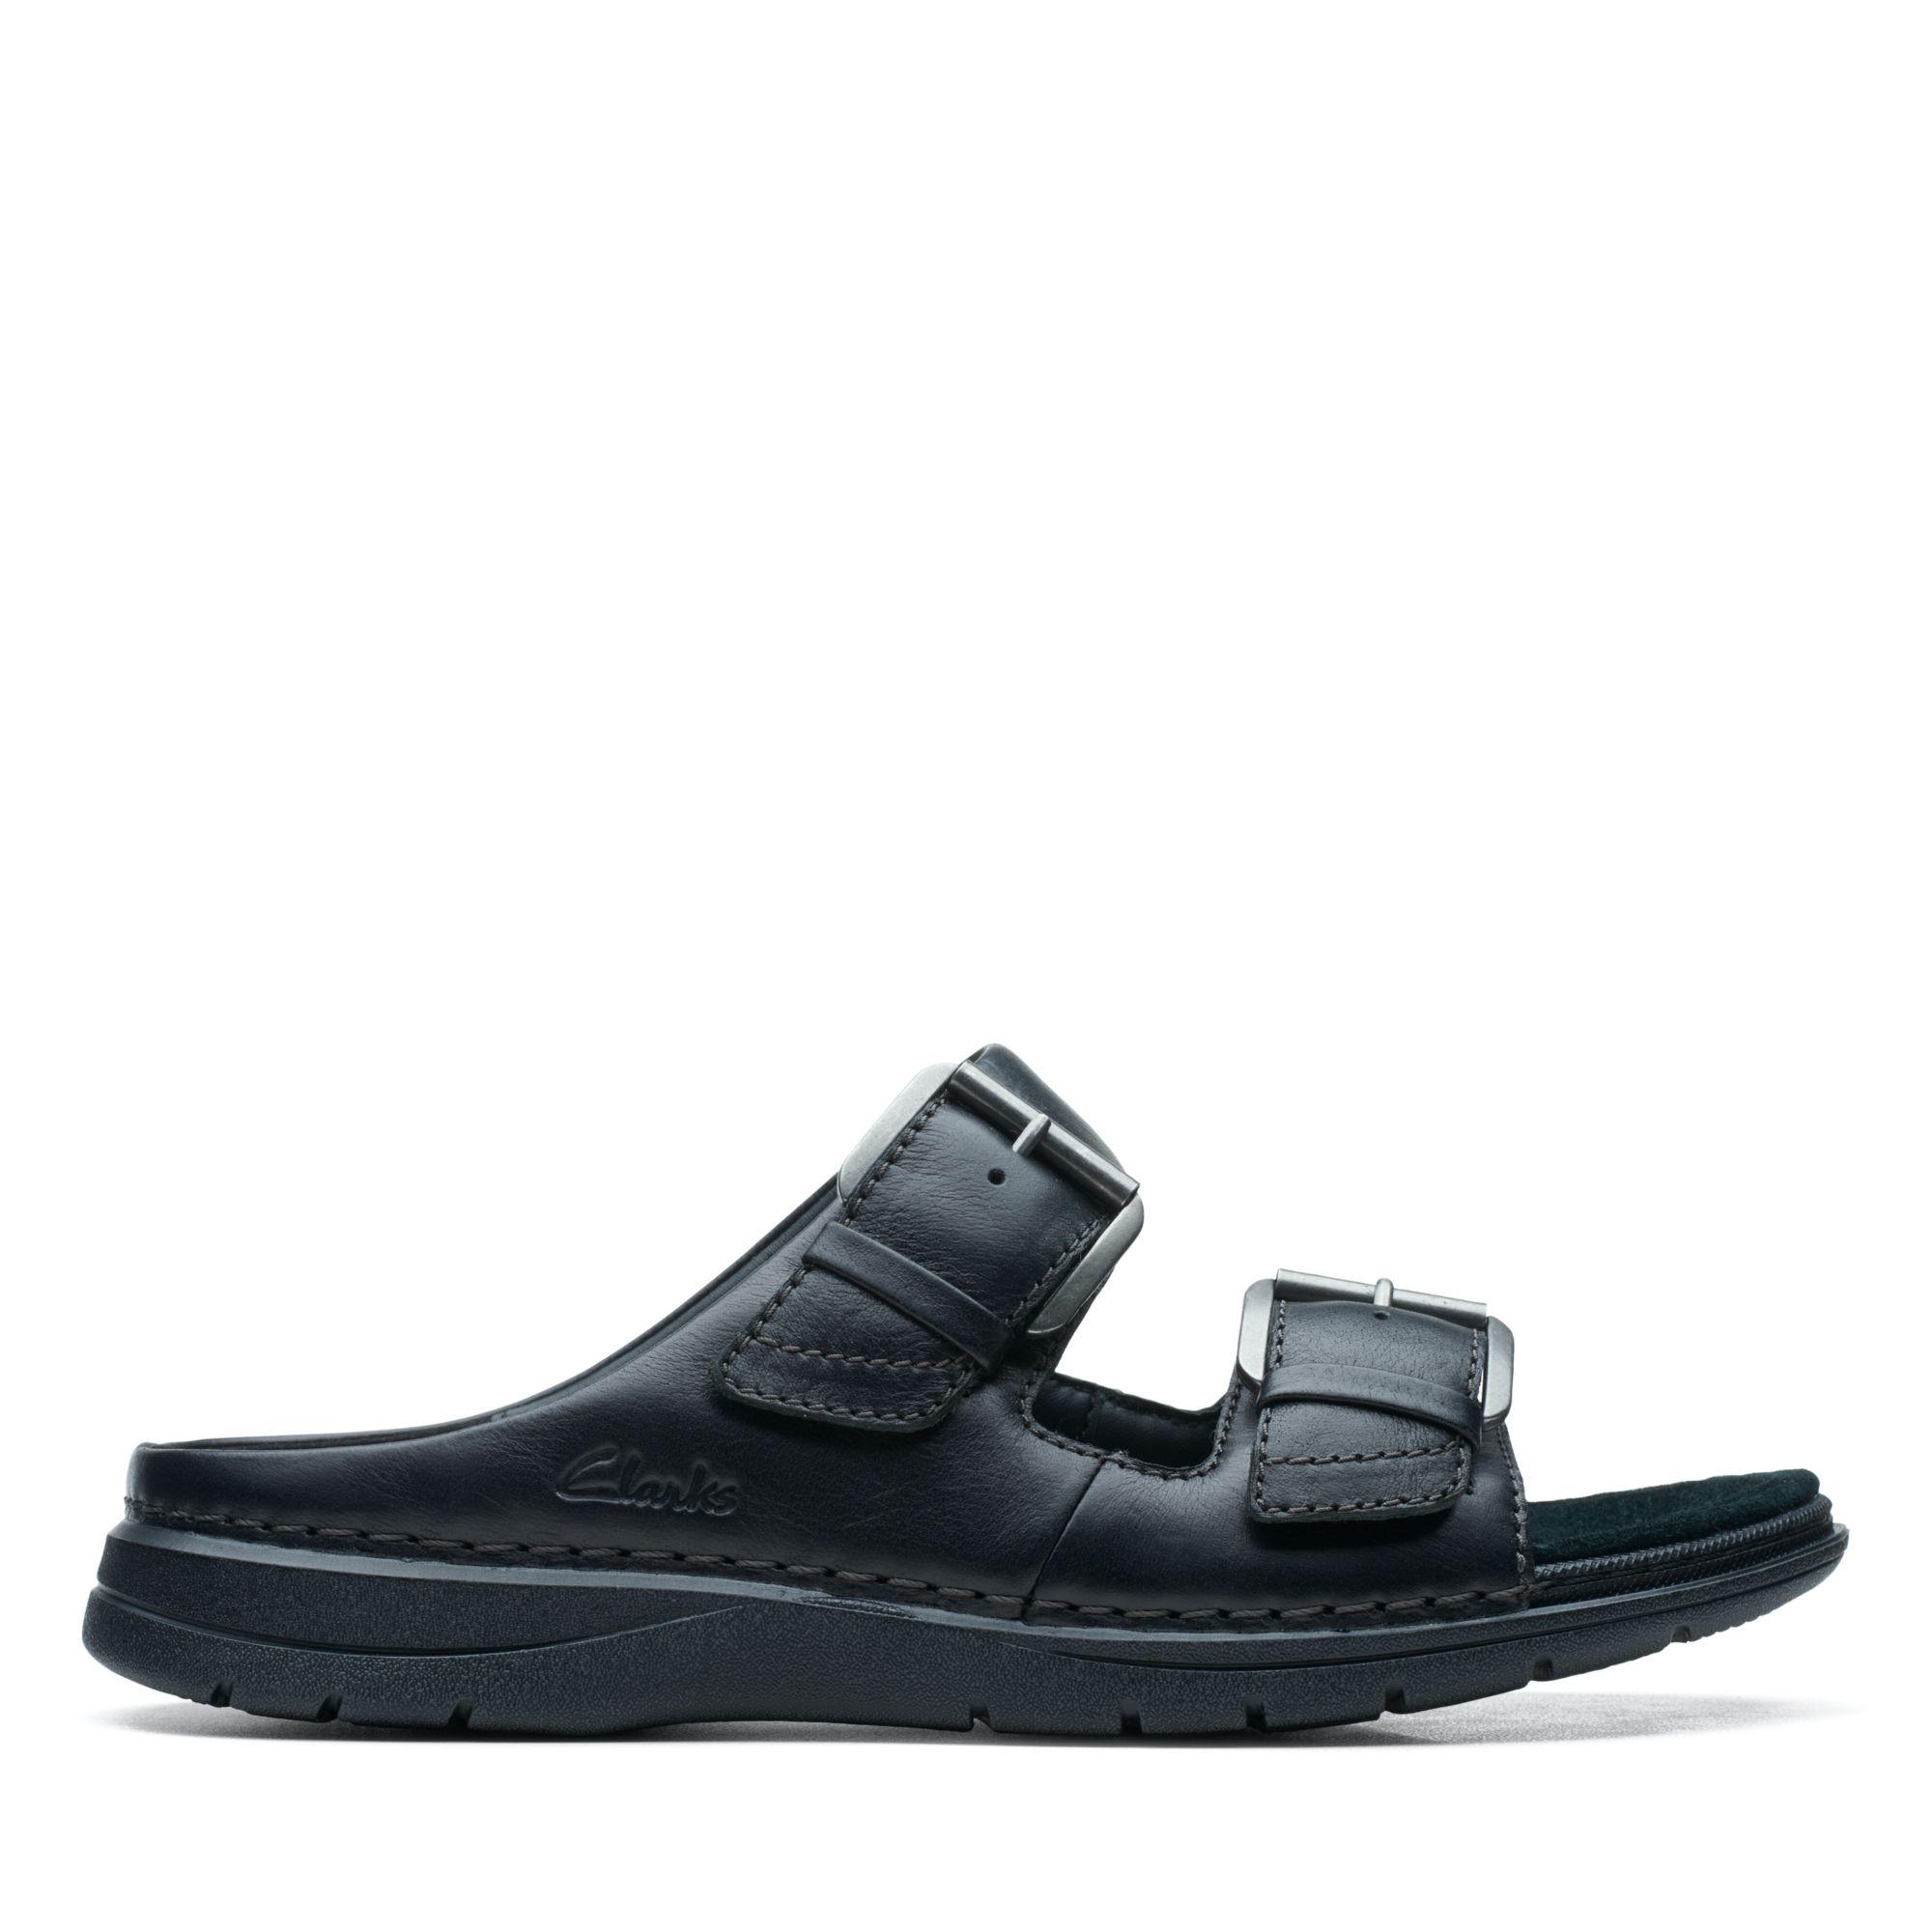 Clarks-UN自然家族-Nature Vibe摩鬼氈設計拖鞋(黑)